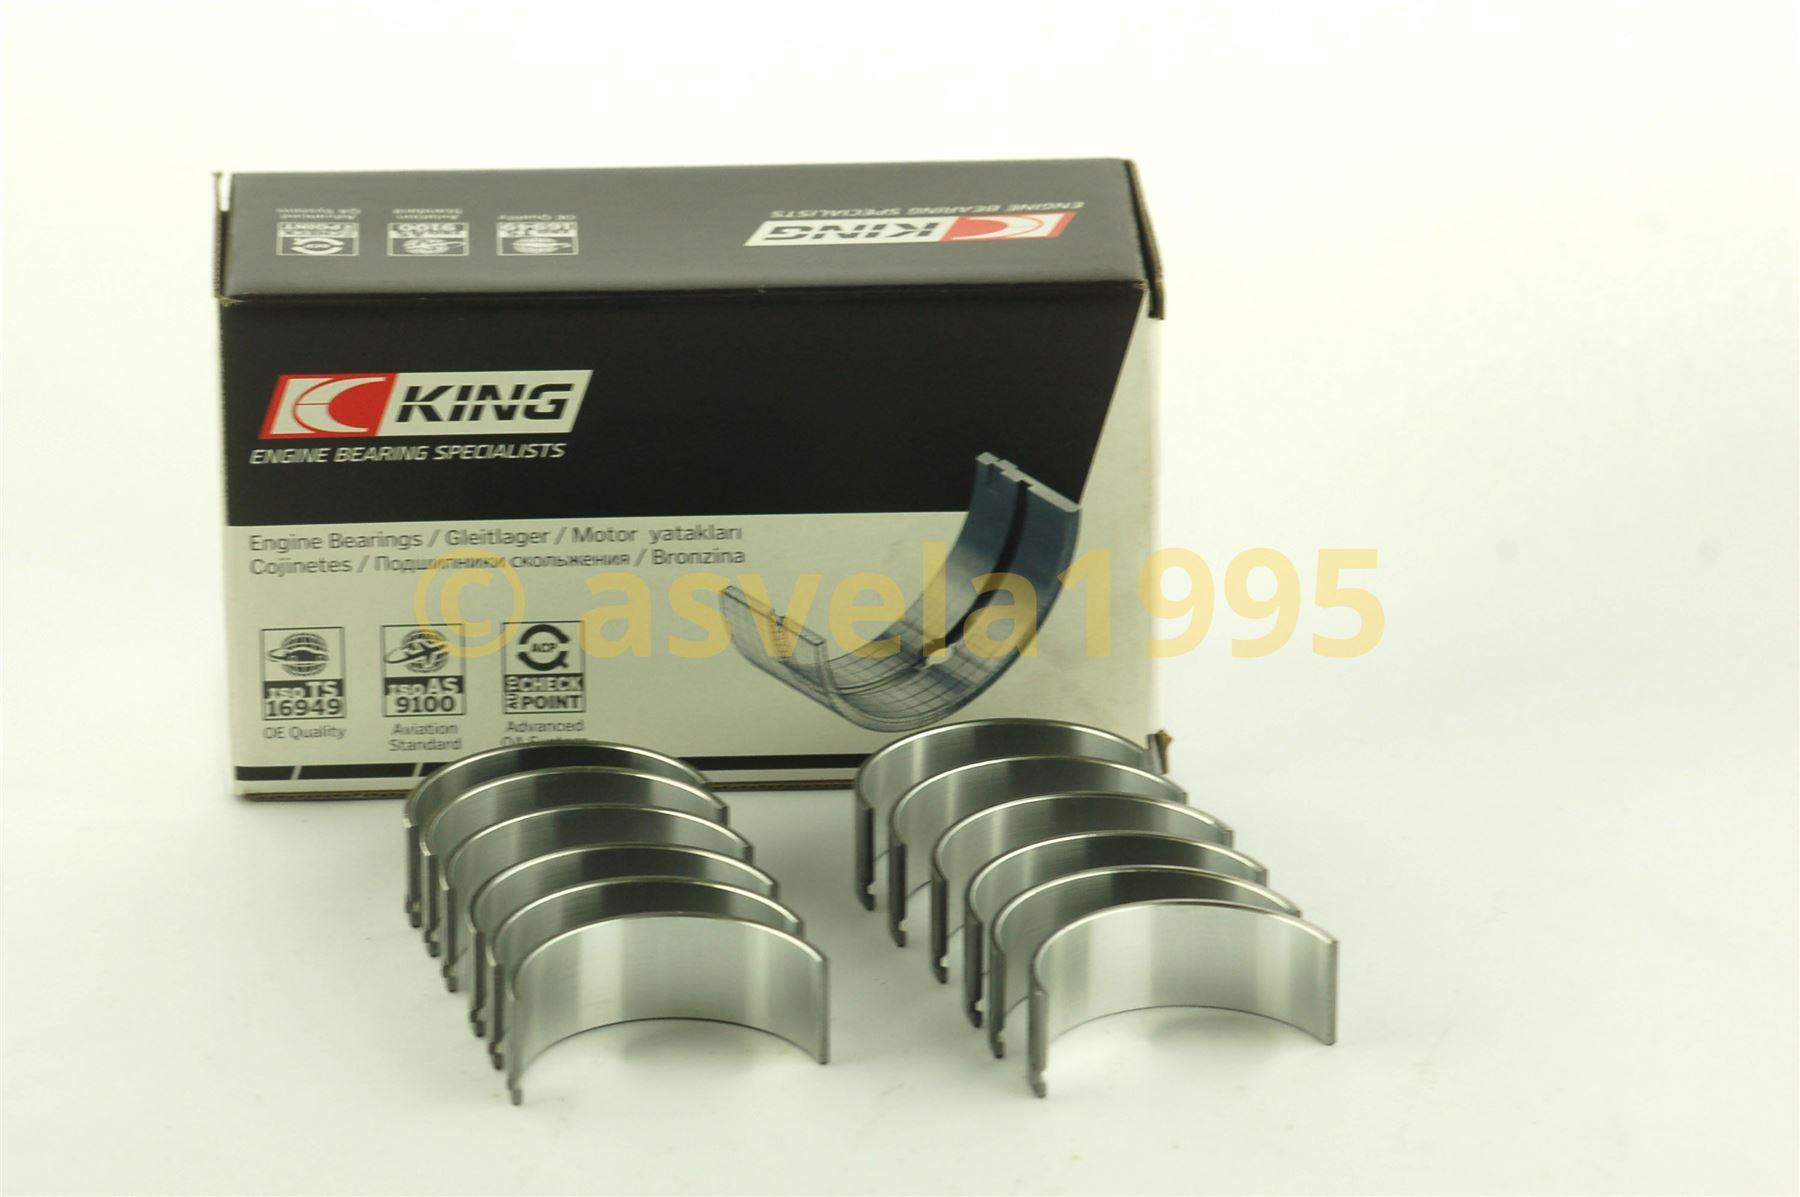 Mitsubishi 3.5 3.8 V6 24V 6G74 6G75 Pajero L200 Eclipse ConRod Bearings STD